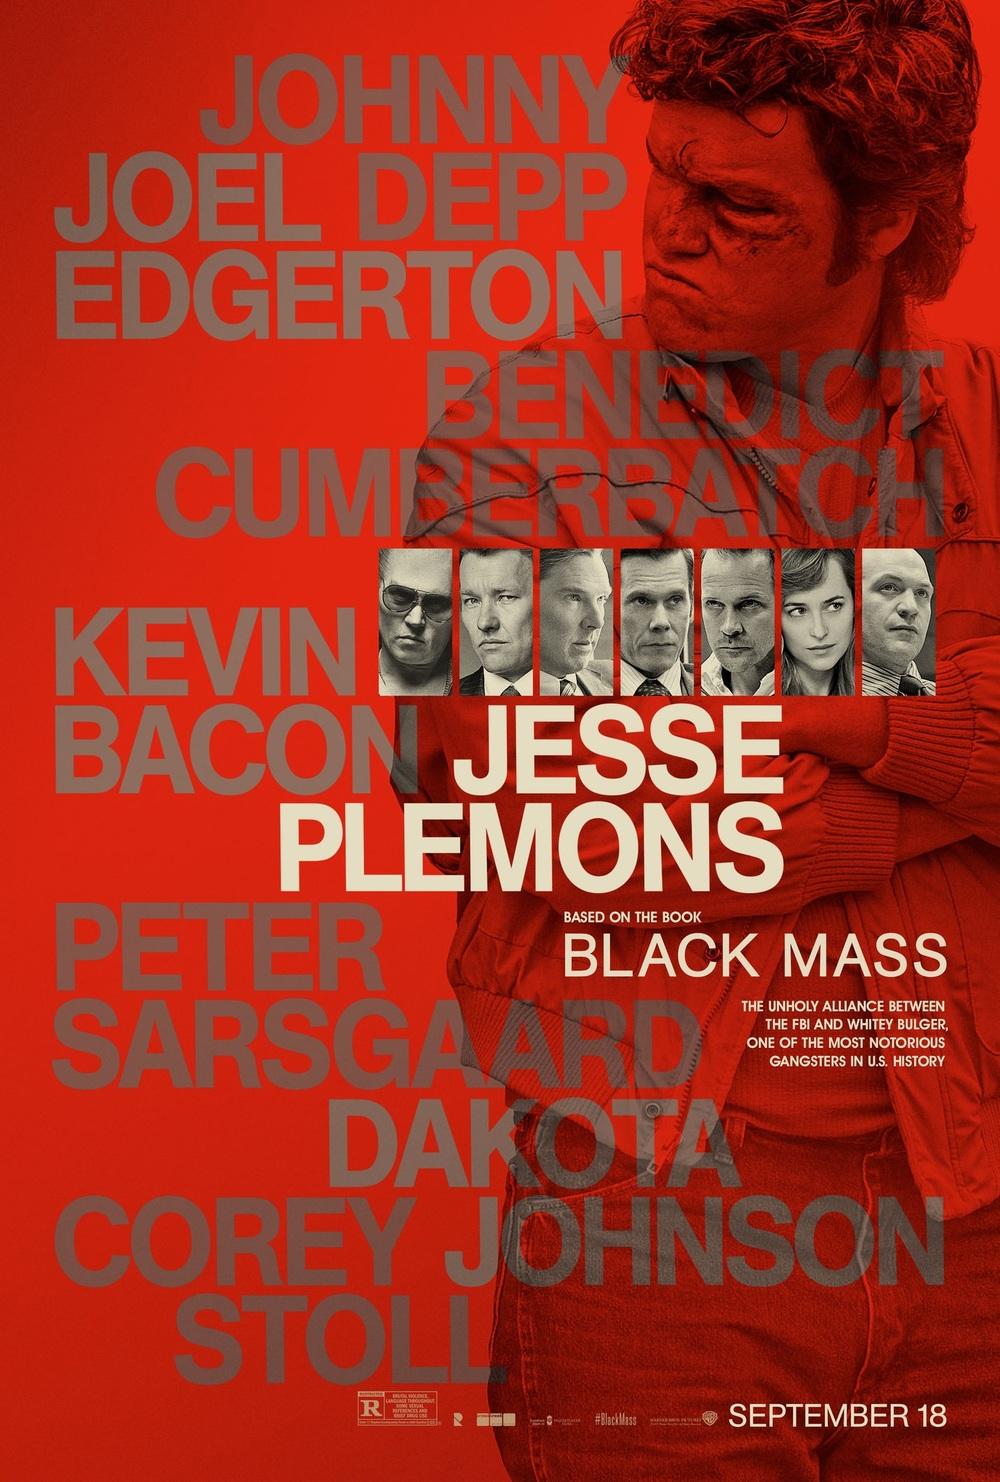 Black mass poster 4 Jesse Plemons.jpg